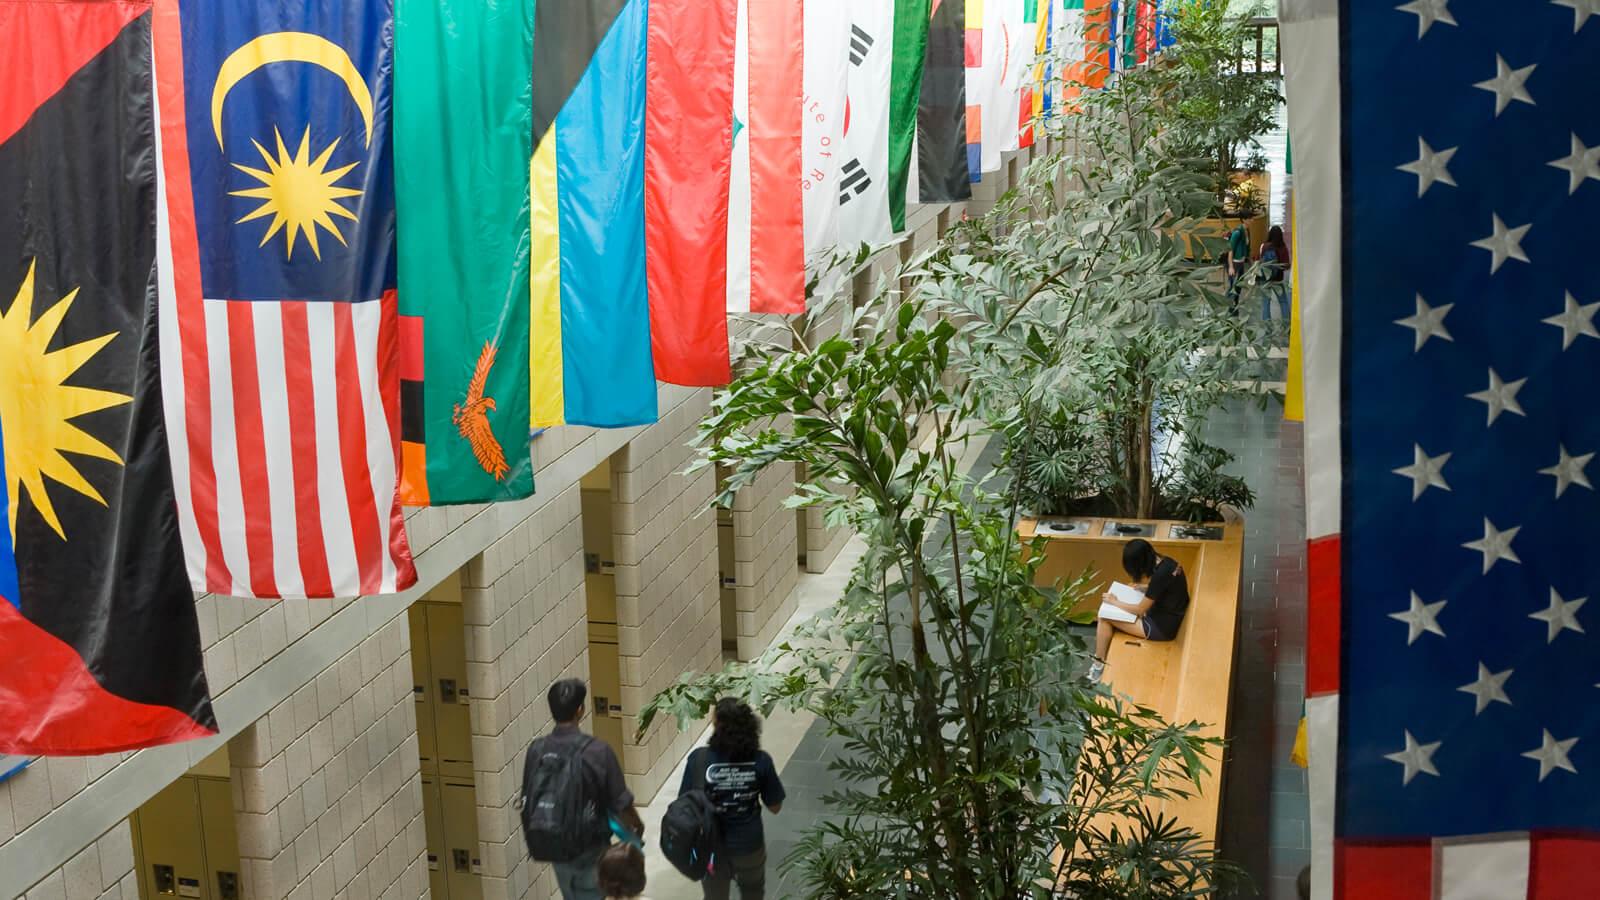 International flags in the halls of Duke Fuqua